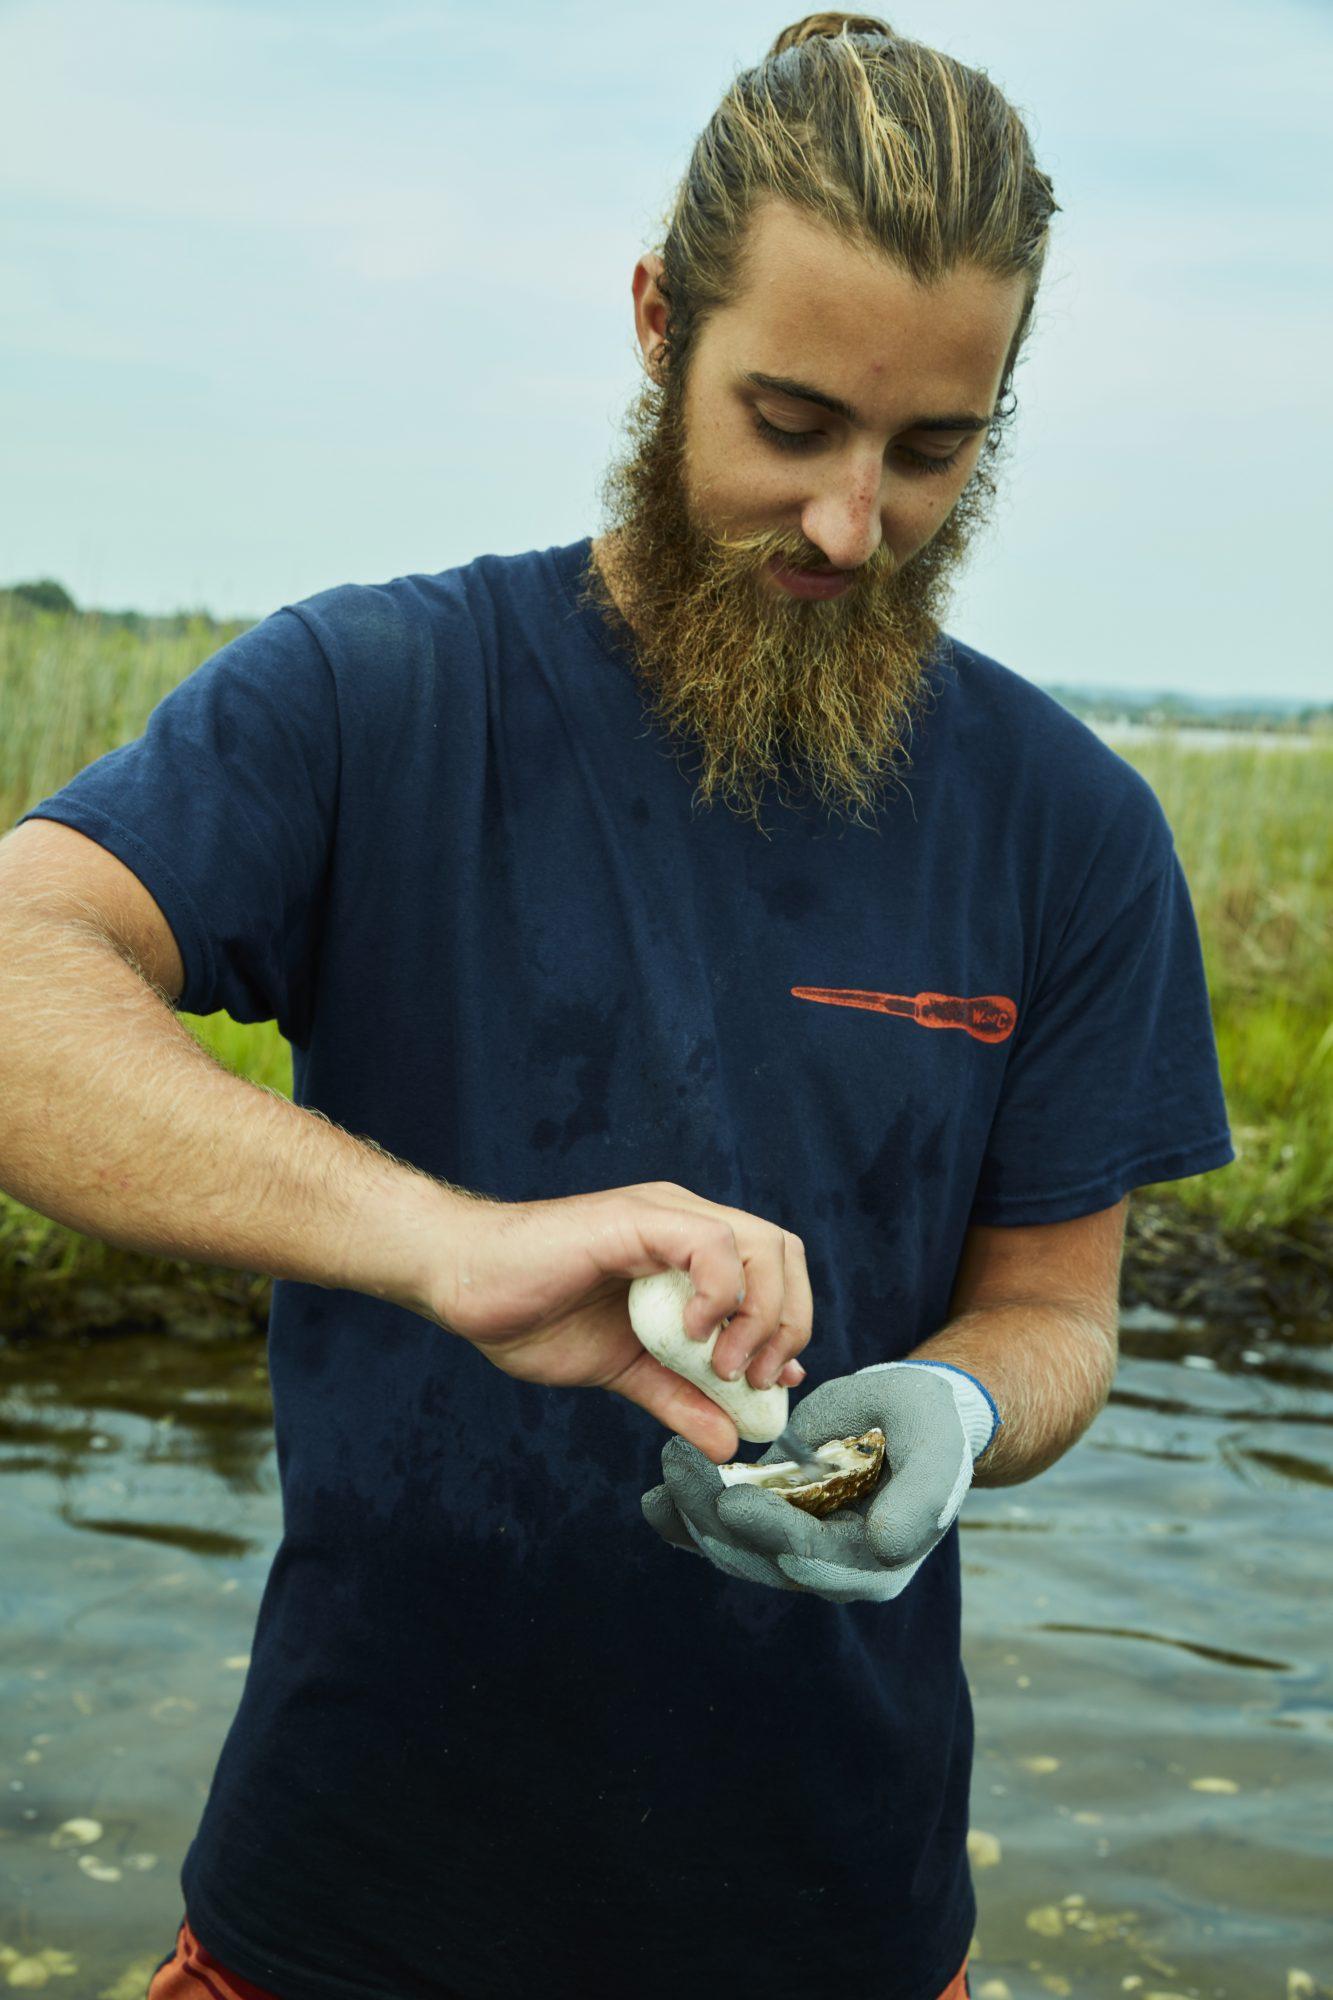 oyster shucking man